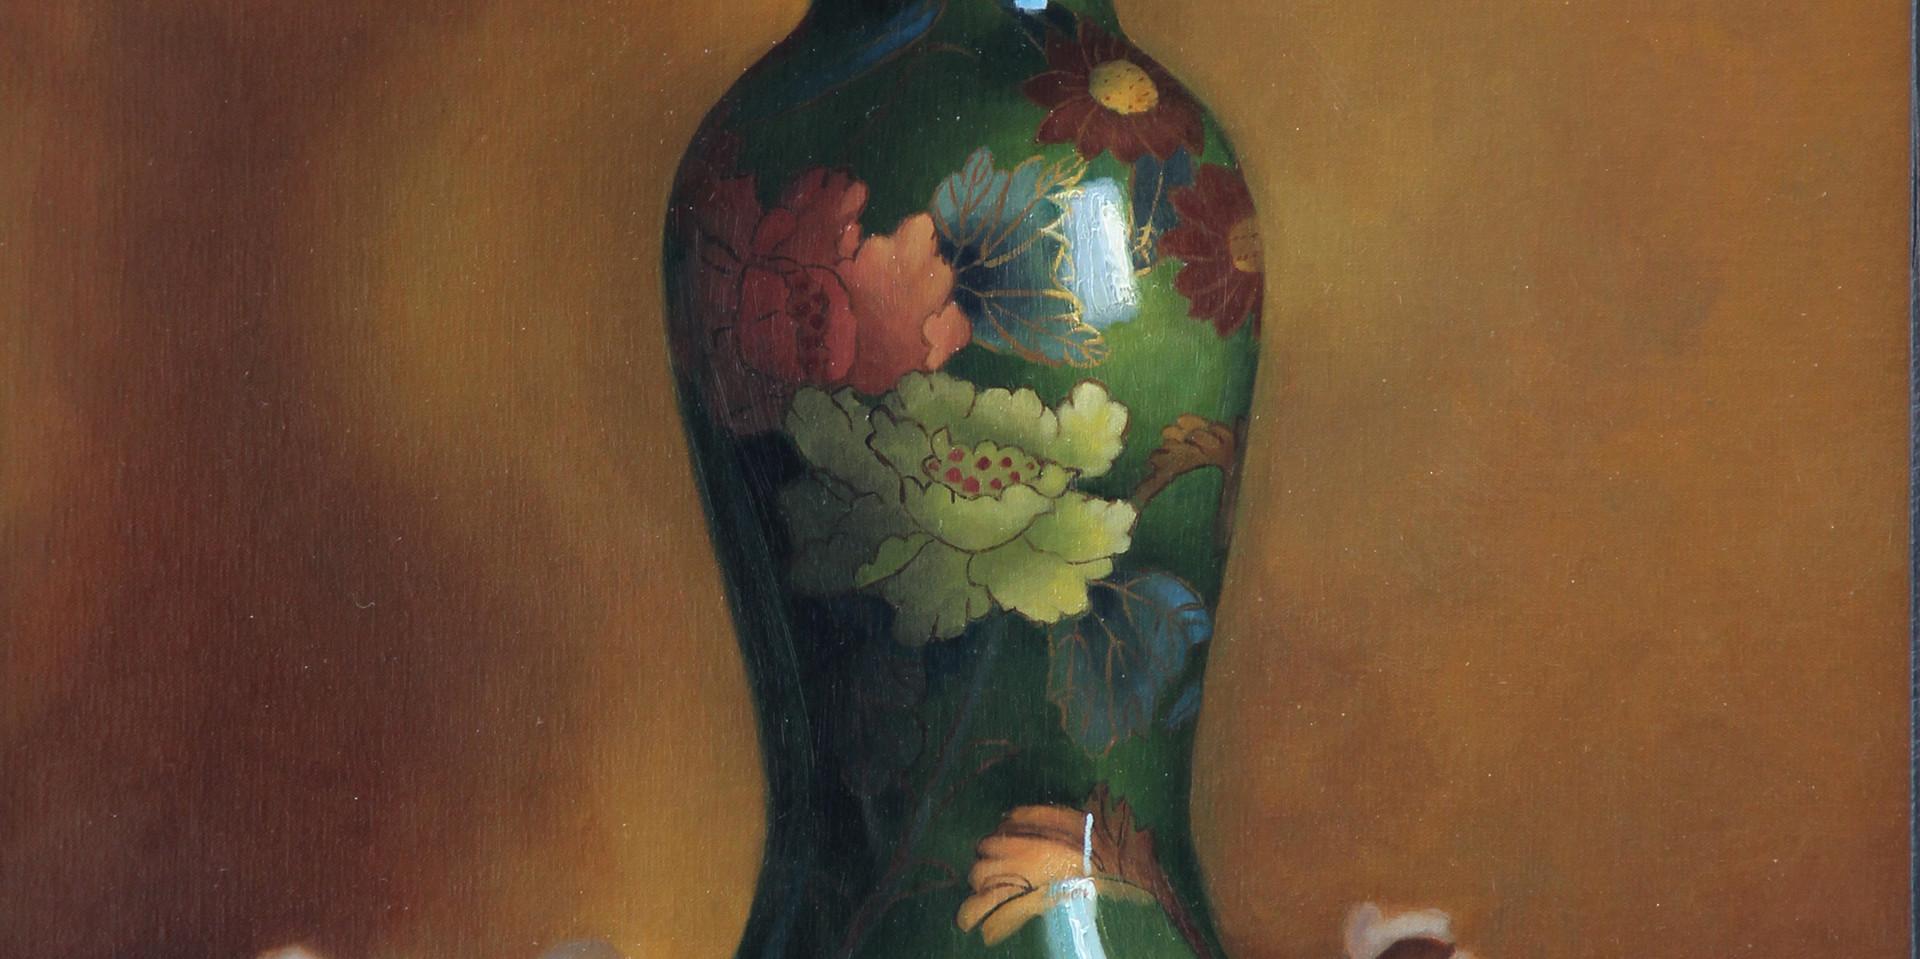 The green vase